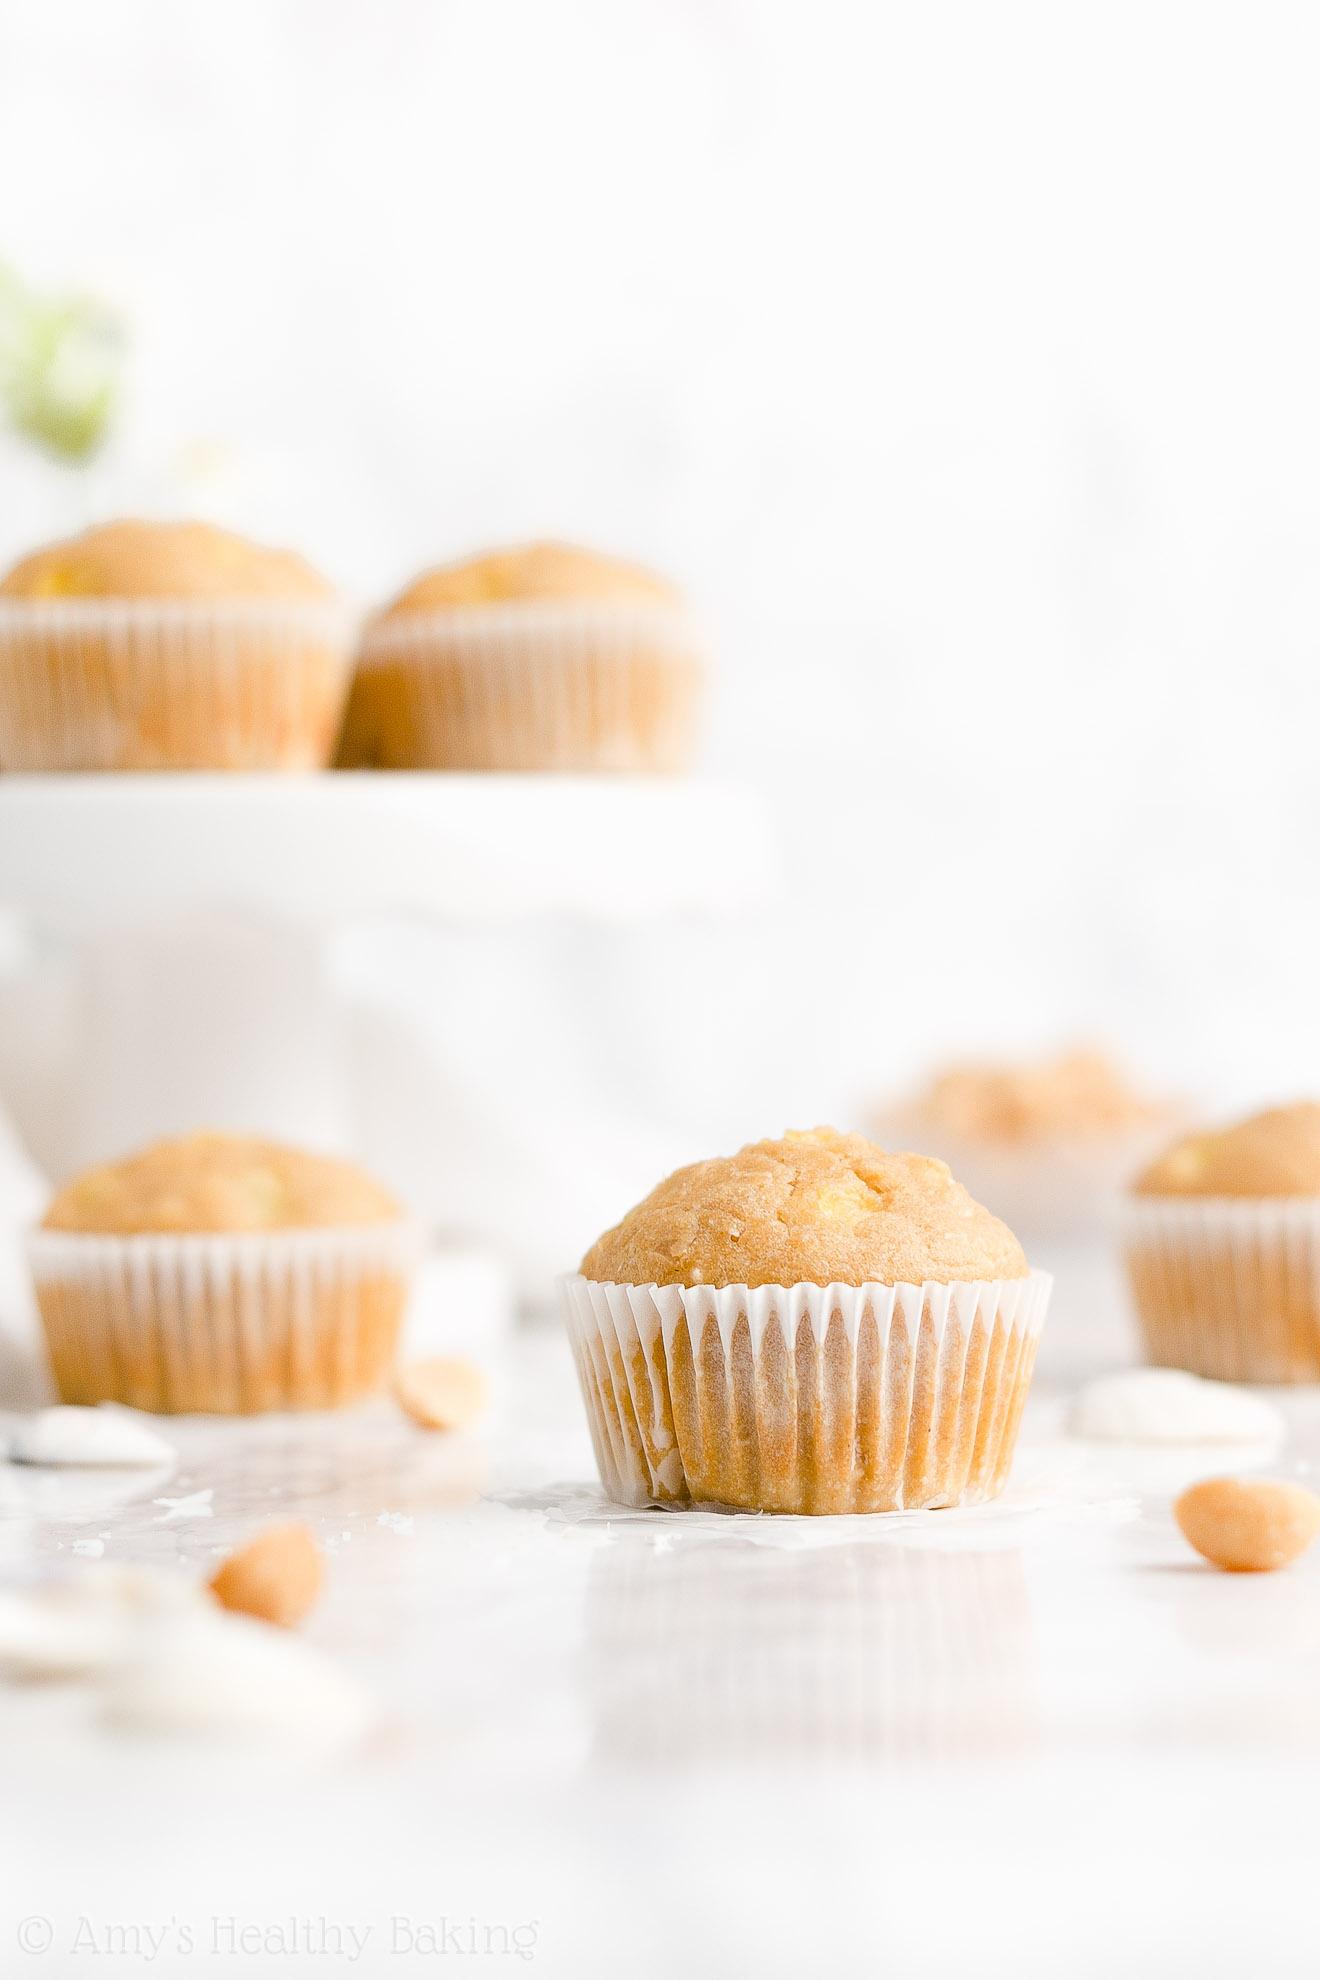 Fluffy Moist Healthy Gluten Free Pineapple, Coconut & Macadamia Nut Muffins